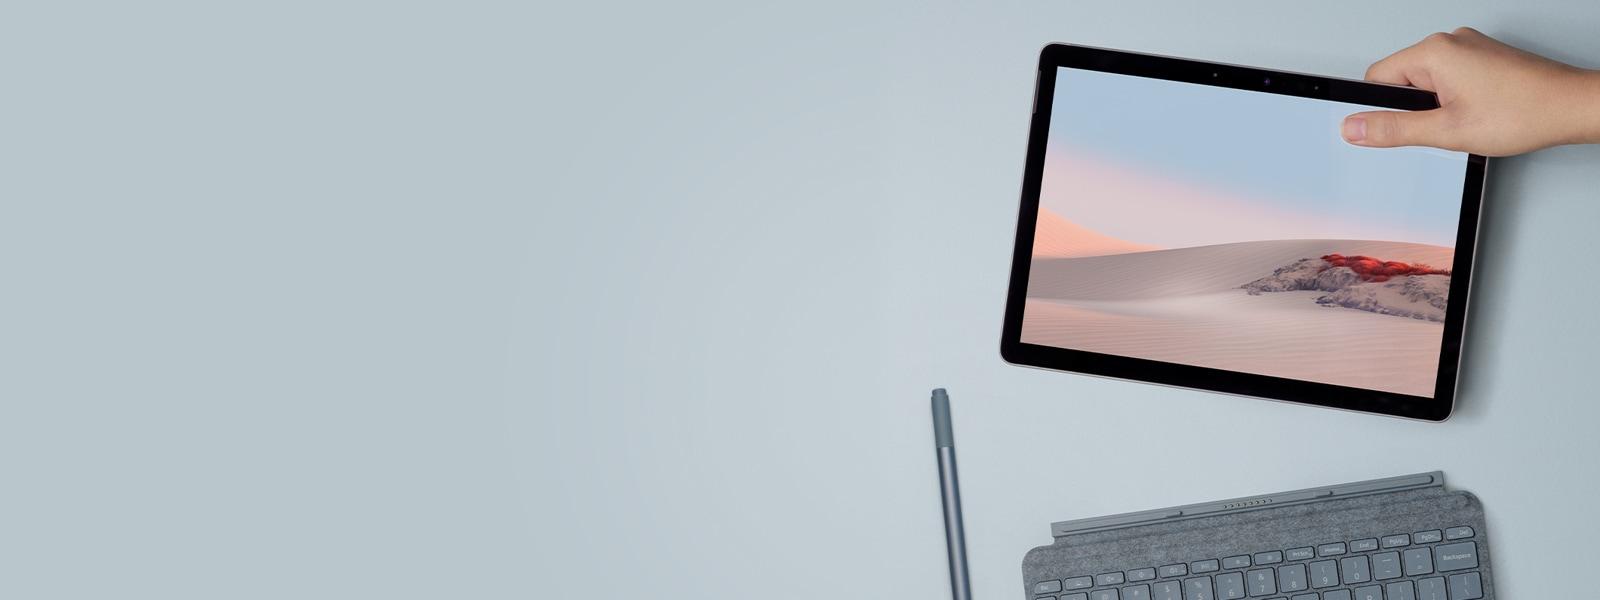 Surface Go 2을(를) 들고 있는 사람의 손, Surface 펜 및 타이핑 커버